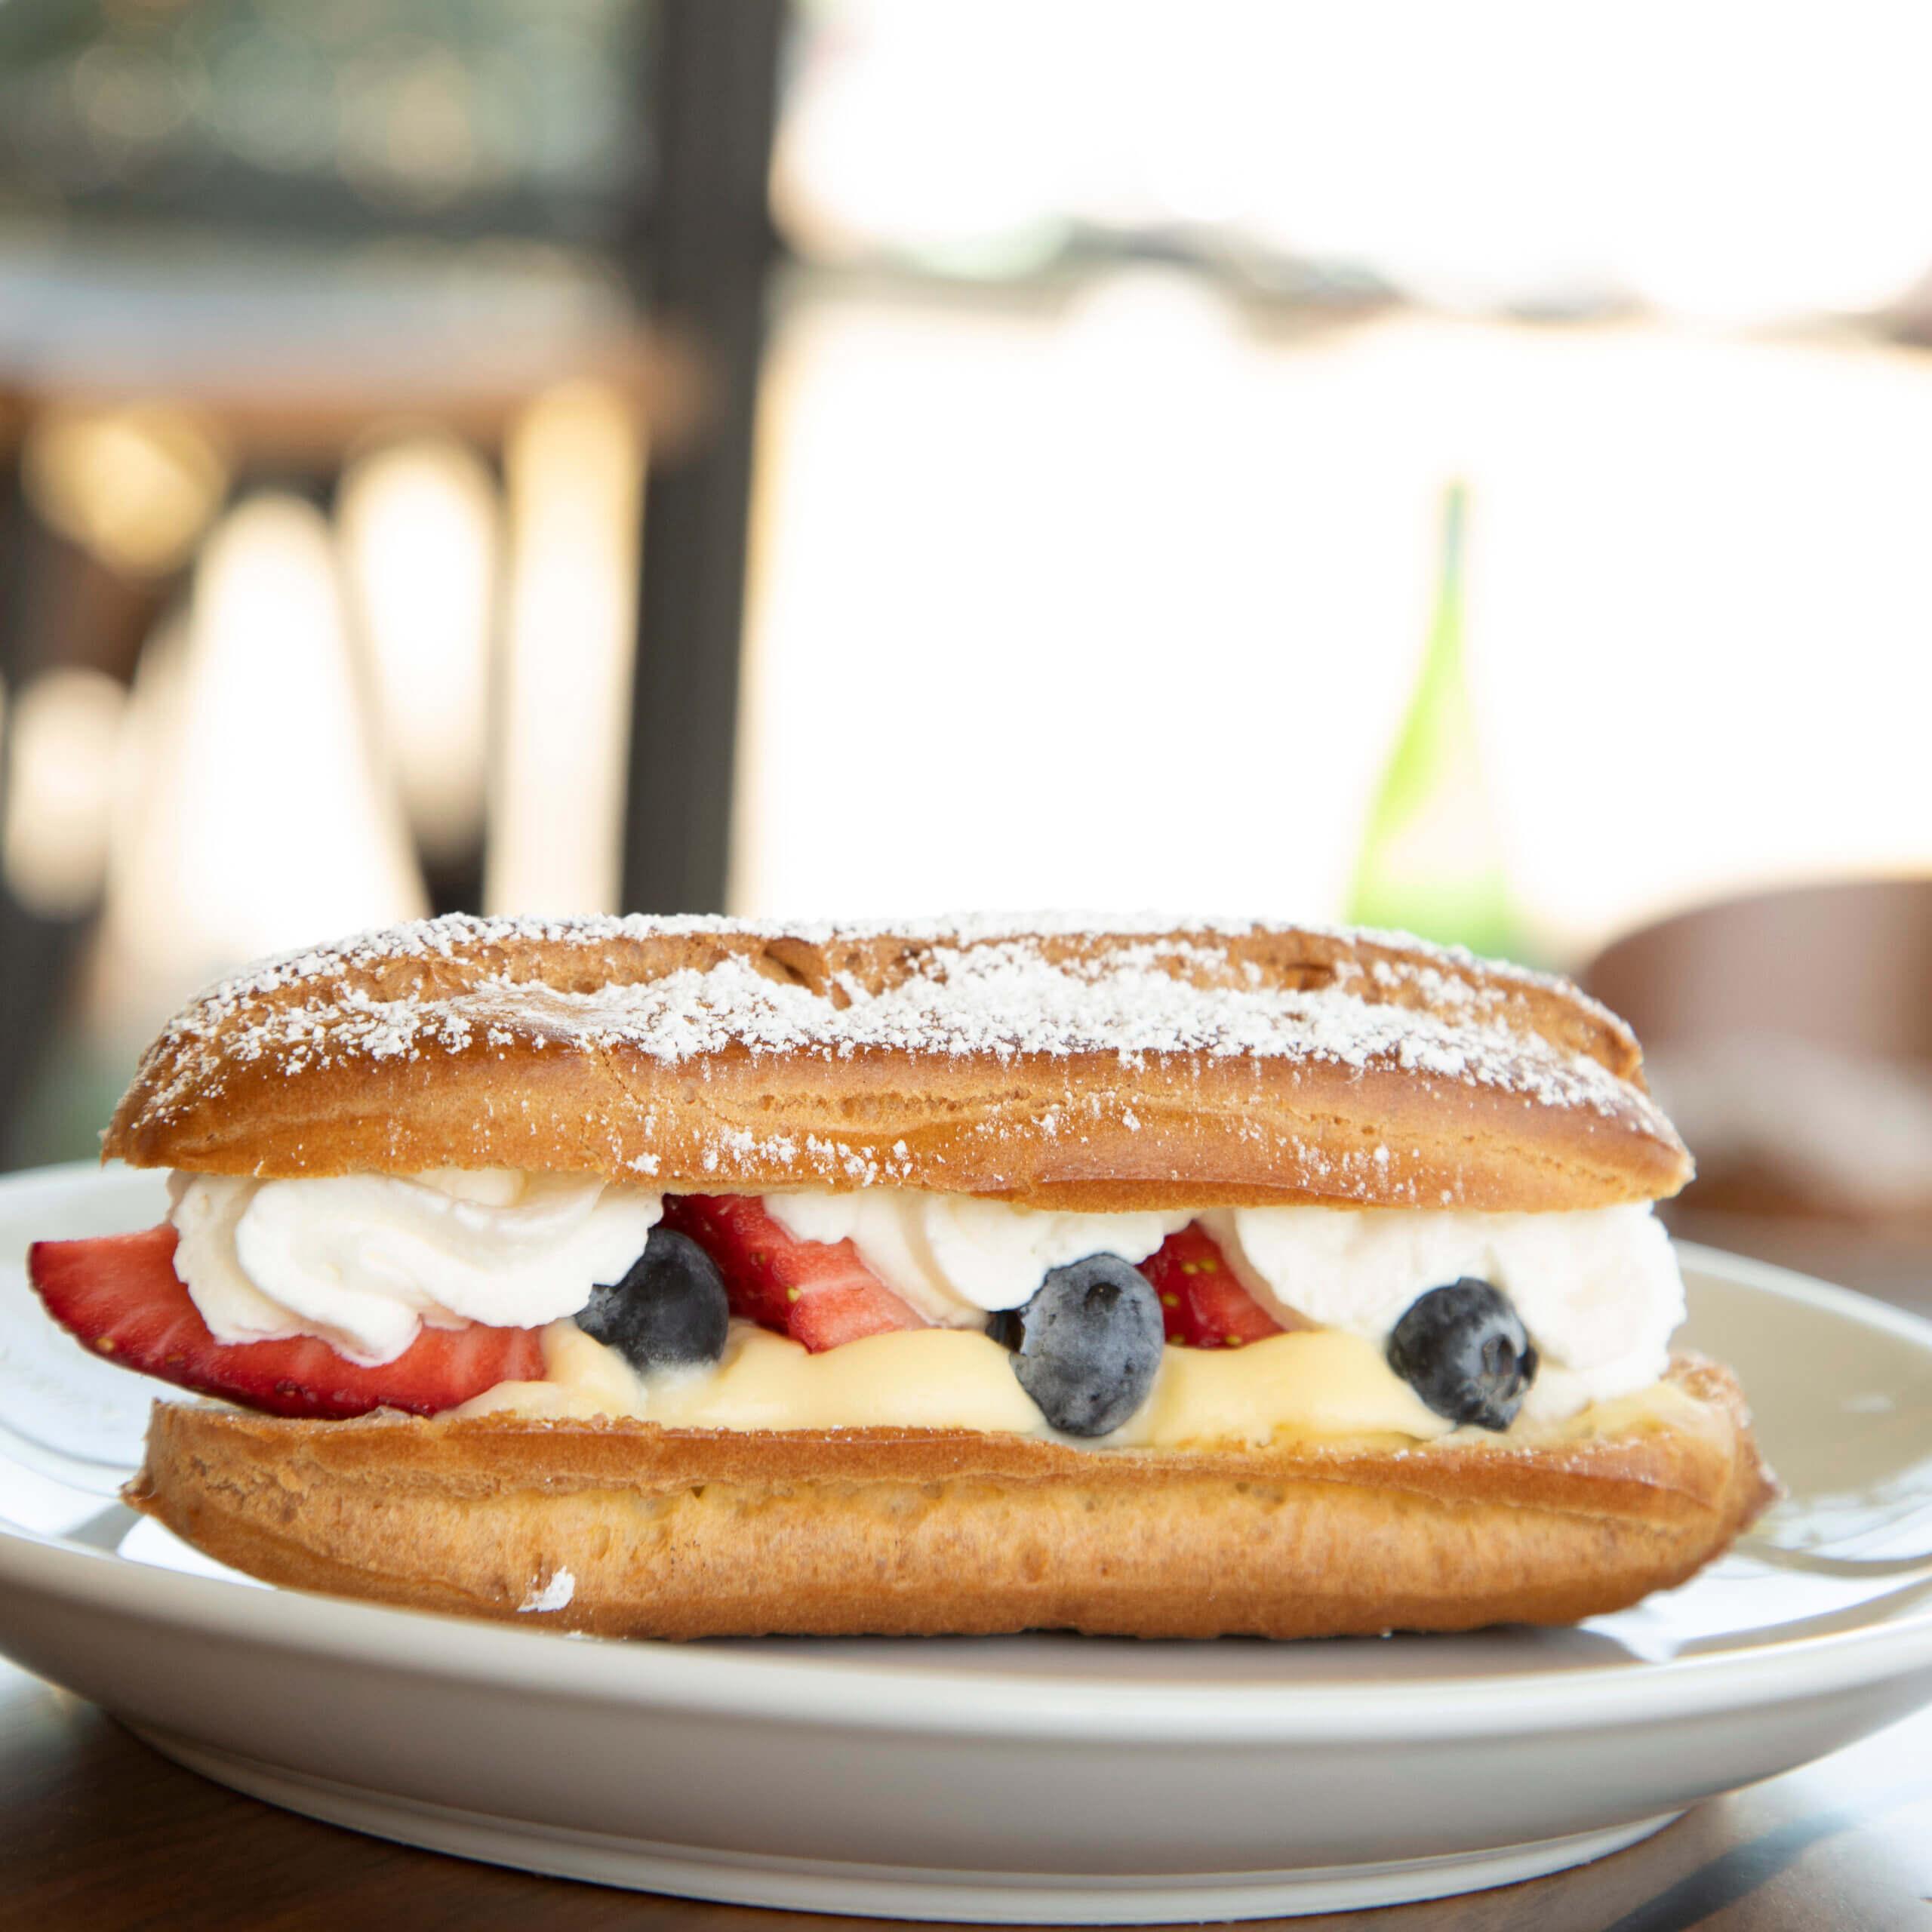 Celtica Bakery - Pastries